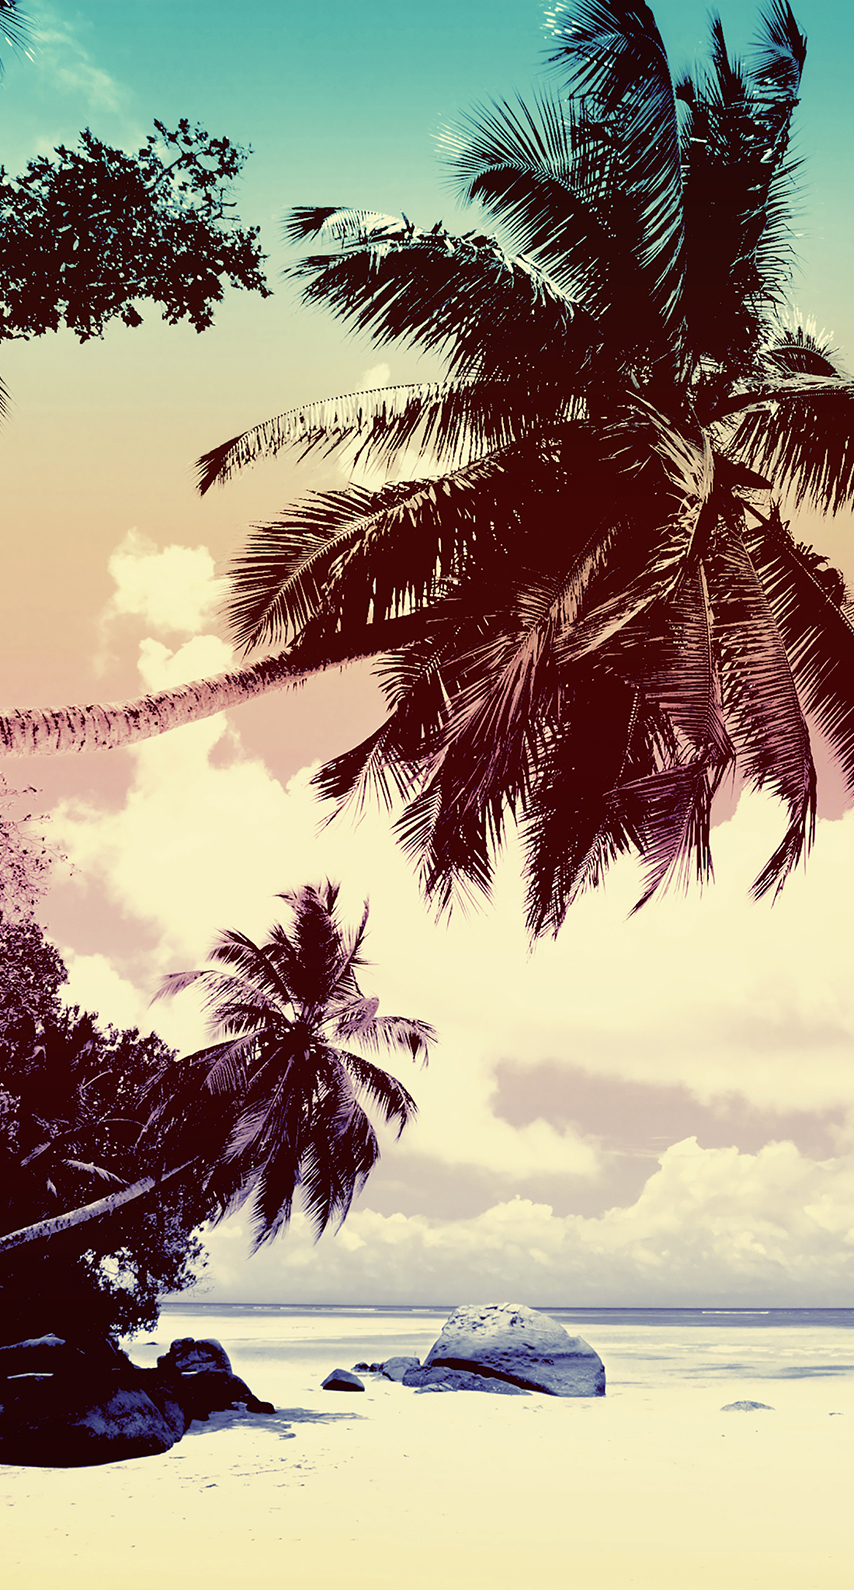 exotic, sand, sun, no person, idyllic, surf, seascape, palm, seashore, computer wallpaper, stock photography, calm, plant, tropics, palm tree, arecales